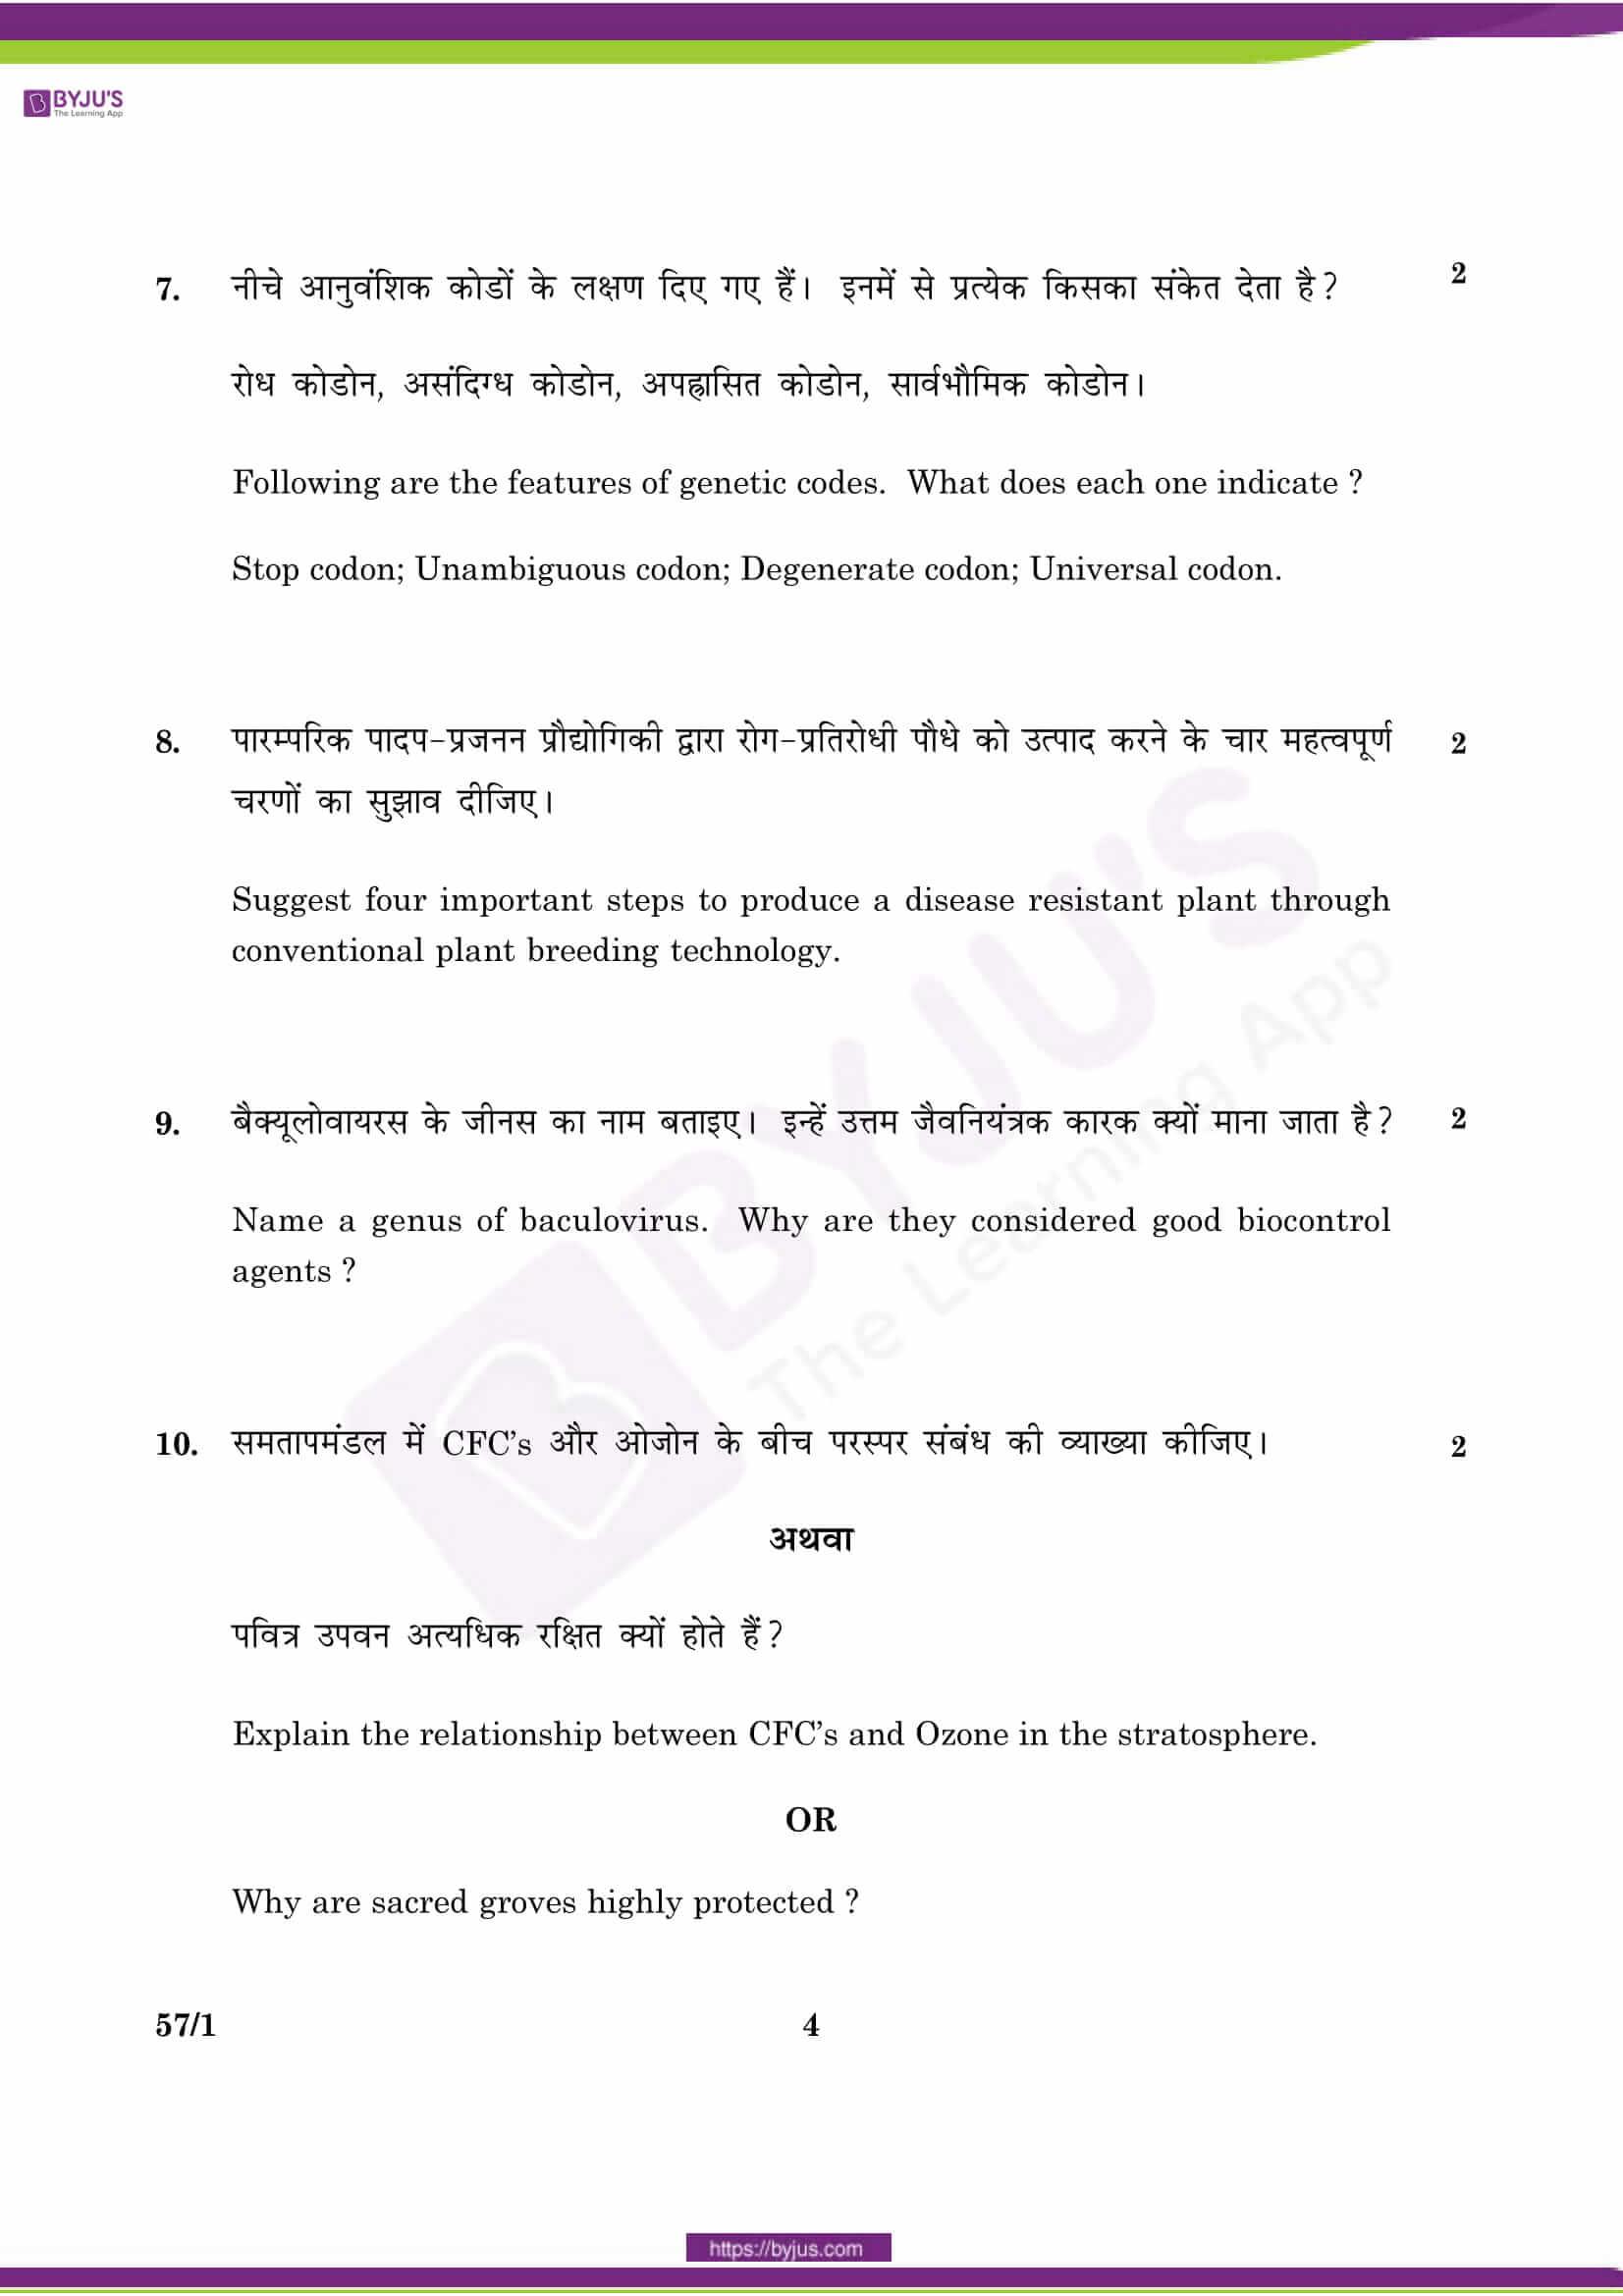 cbse class 12 qs paper 2016 bio set 1